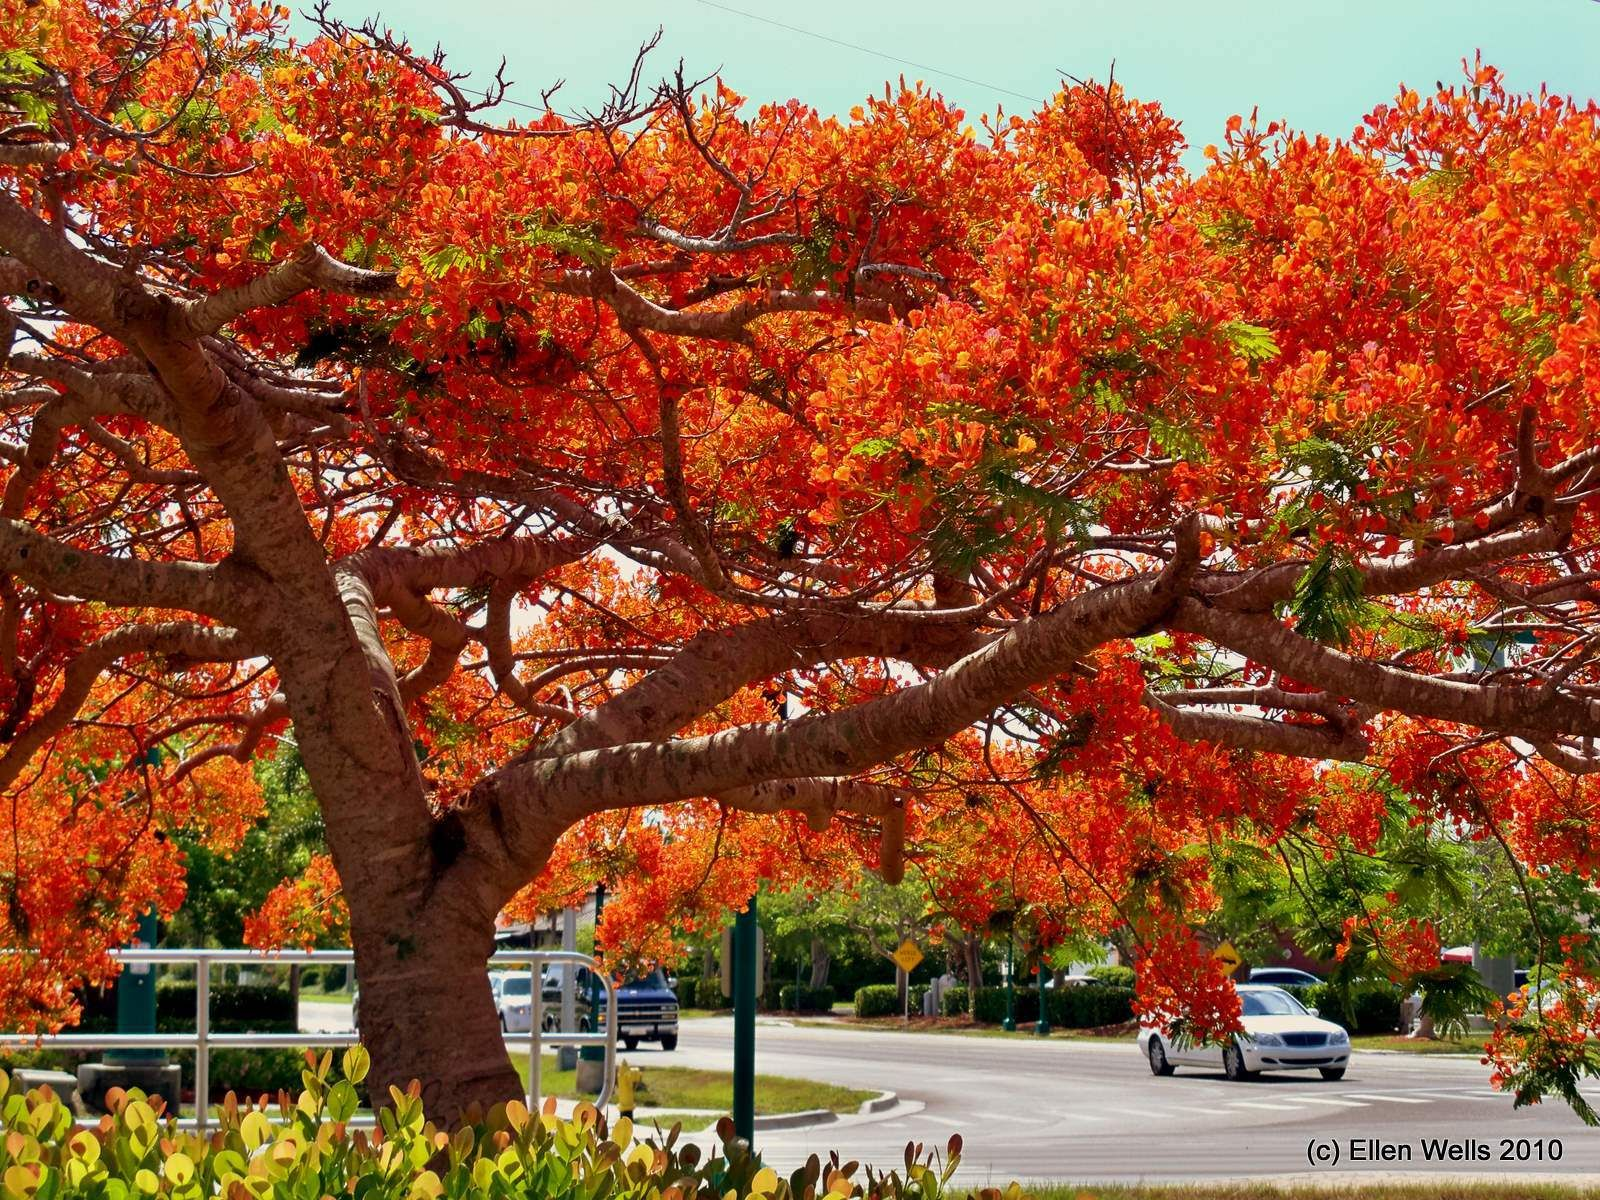 Dark Royal Poinciana Florida Royal Poinciana Florida La Vie Est Belle Pinterest Royal Poinciana Tree Bonsai Royal Poinciana Tree Leaves